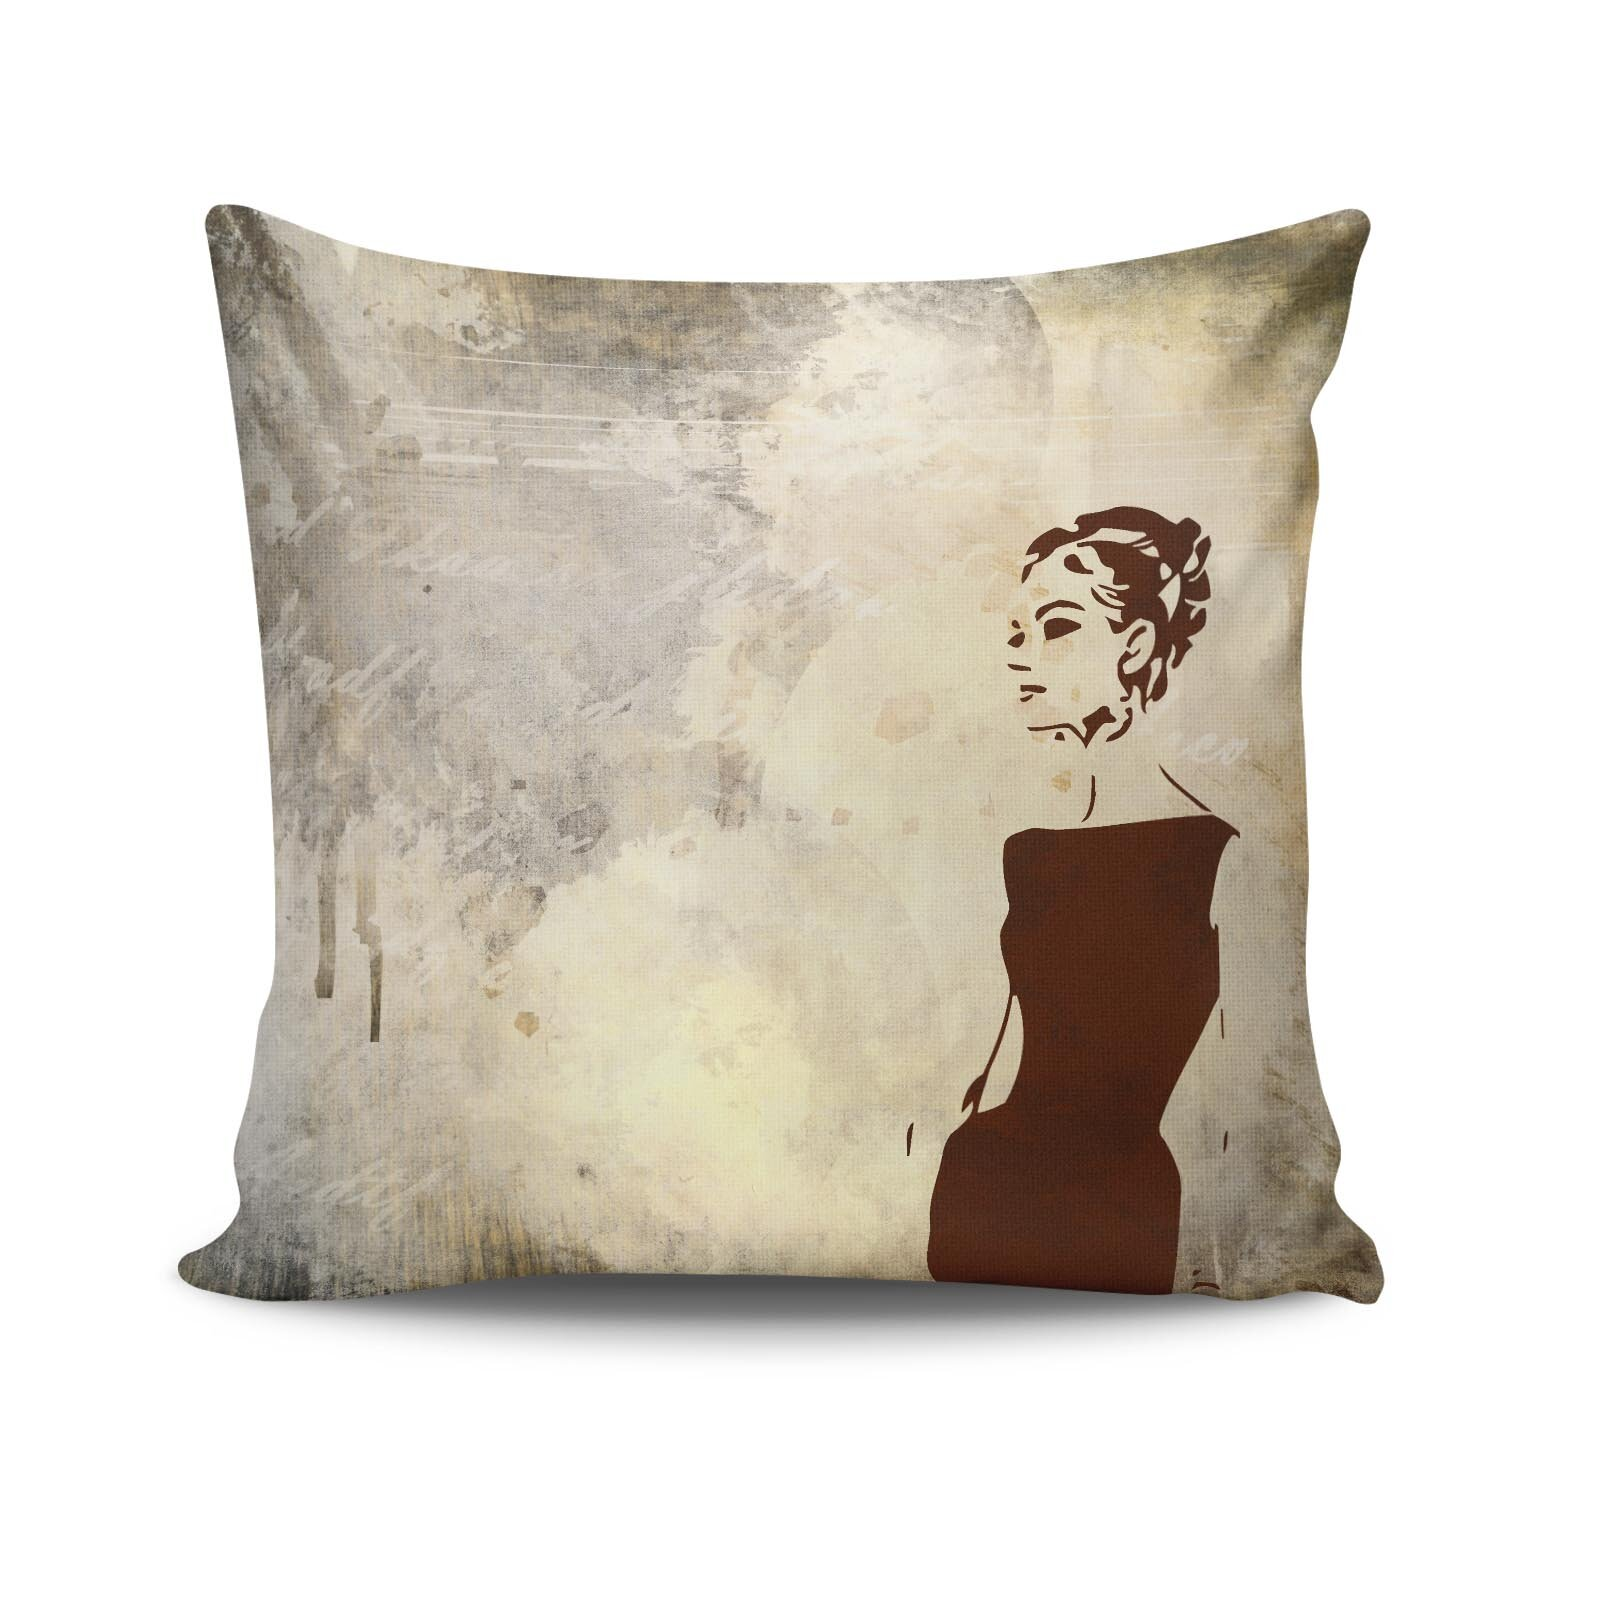 Perna decorativa Kissy, Dimensiune: 45 x 45 cm, Material exterior: 50% bumbac / 50% poliester 422KSY2110